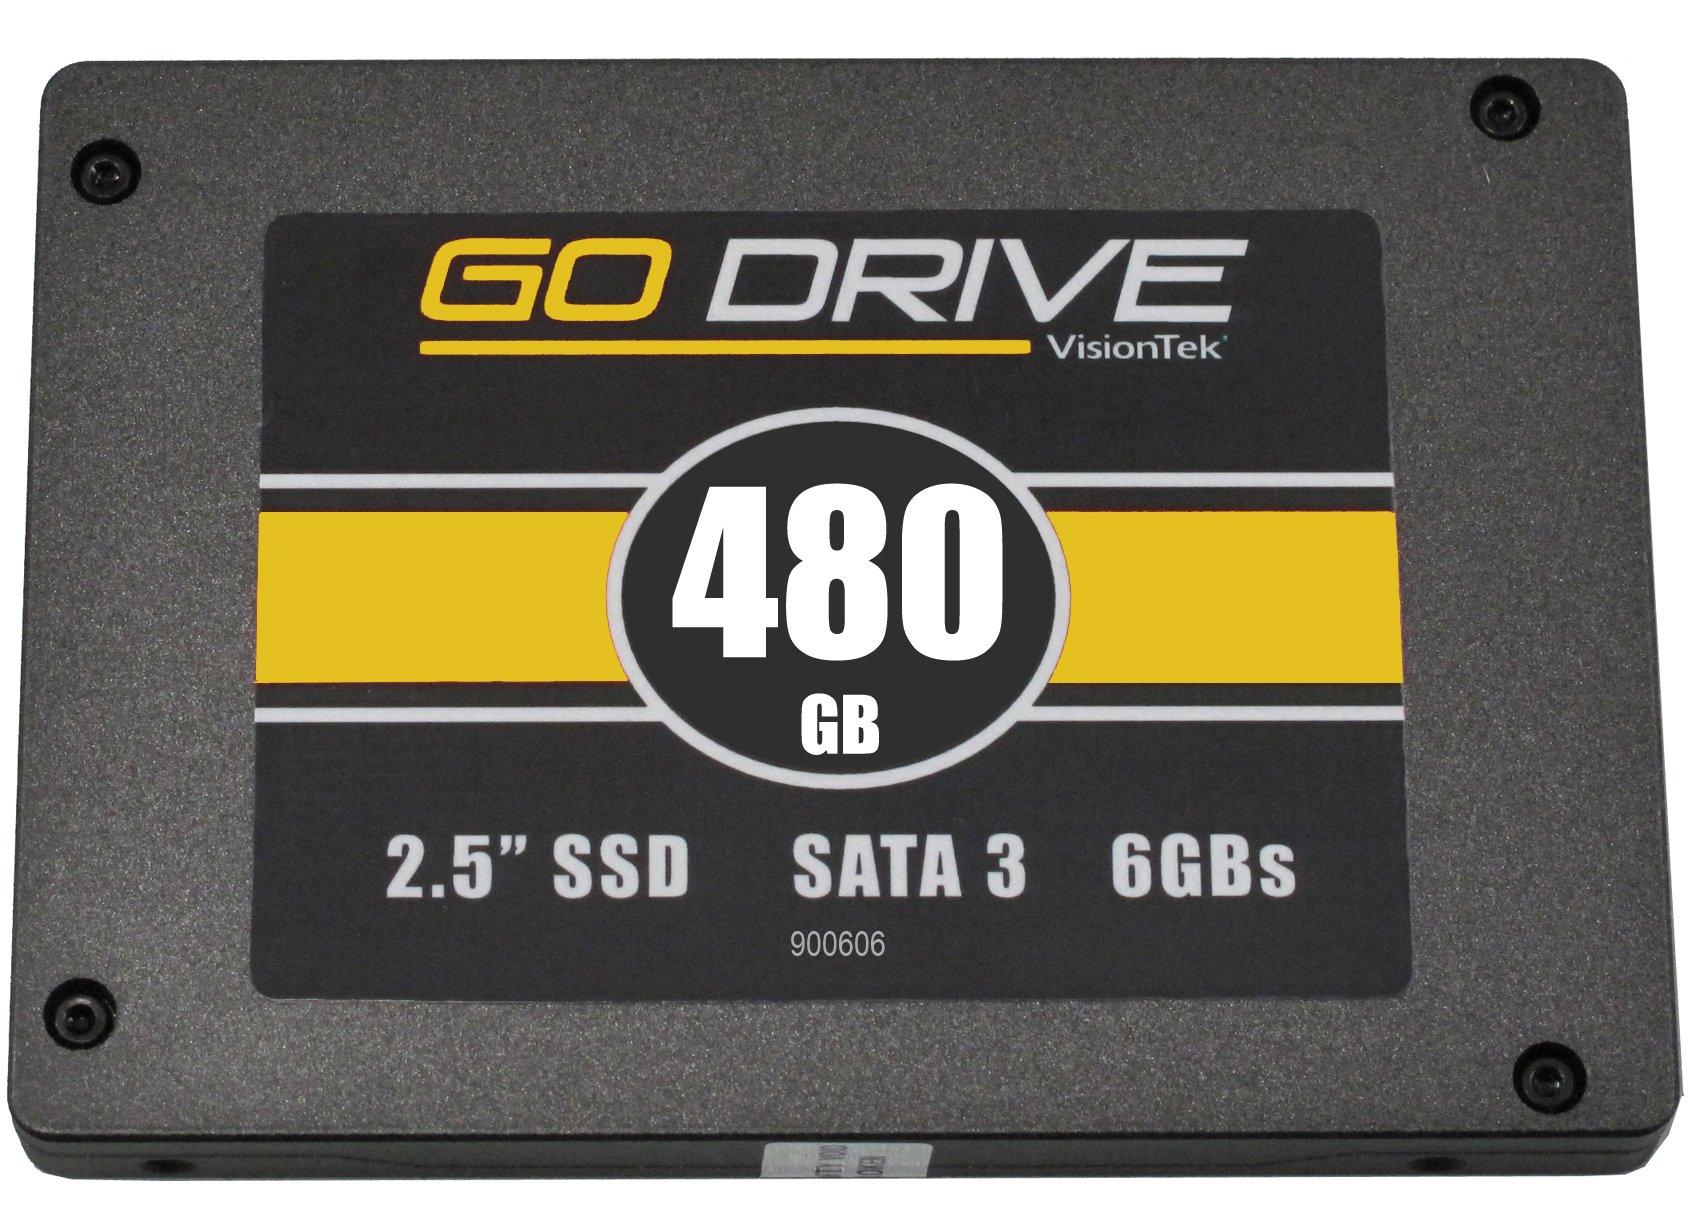 SSD : VisionTek 480GB 9.5mm SATA III Internal 2.5-Inch Solid